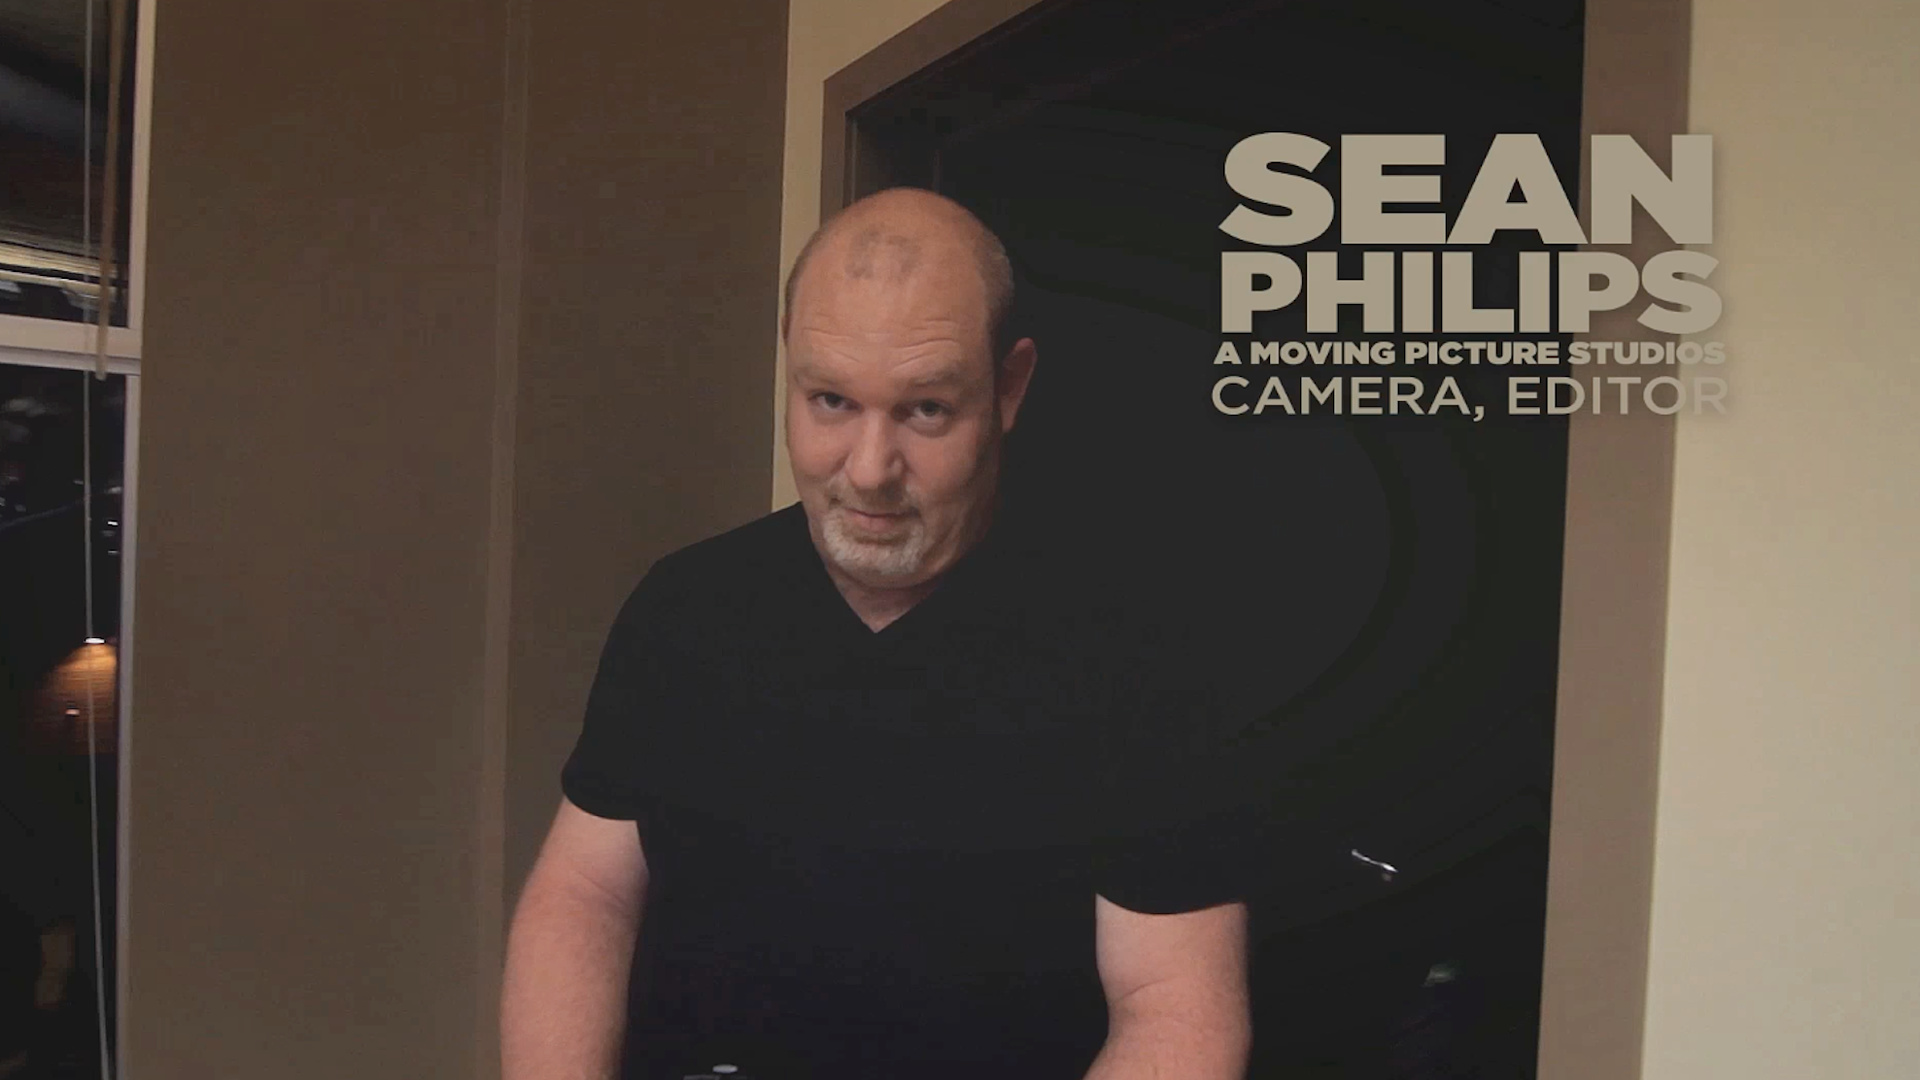 Sean Philips - Camera